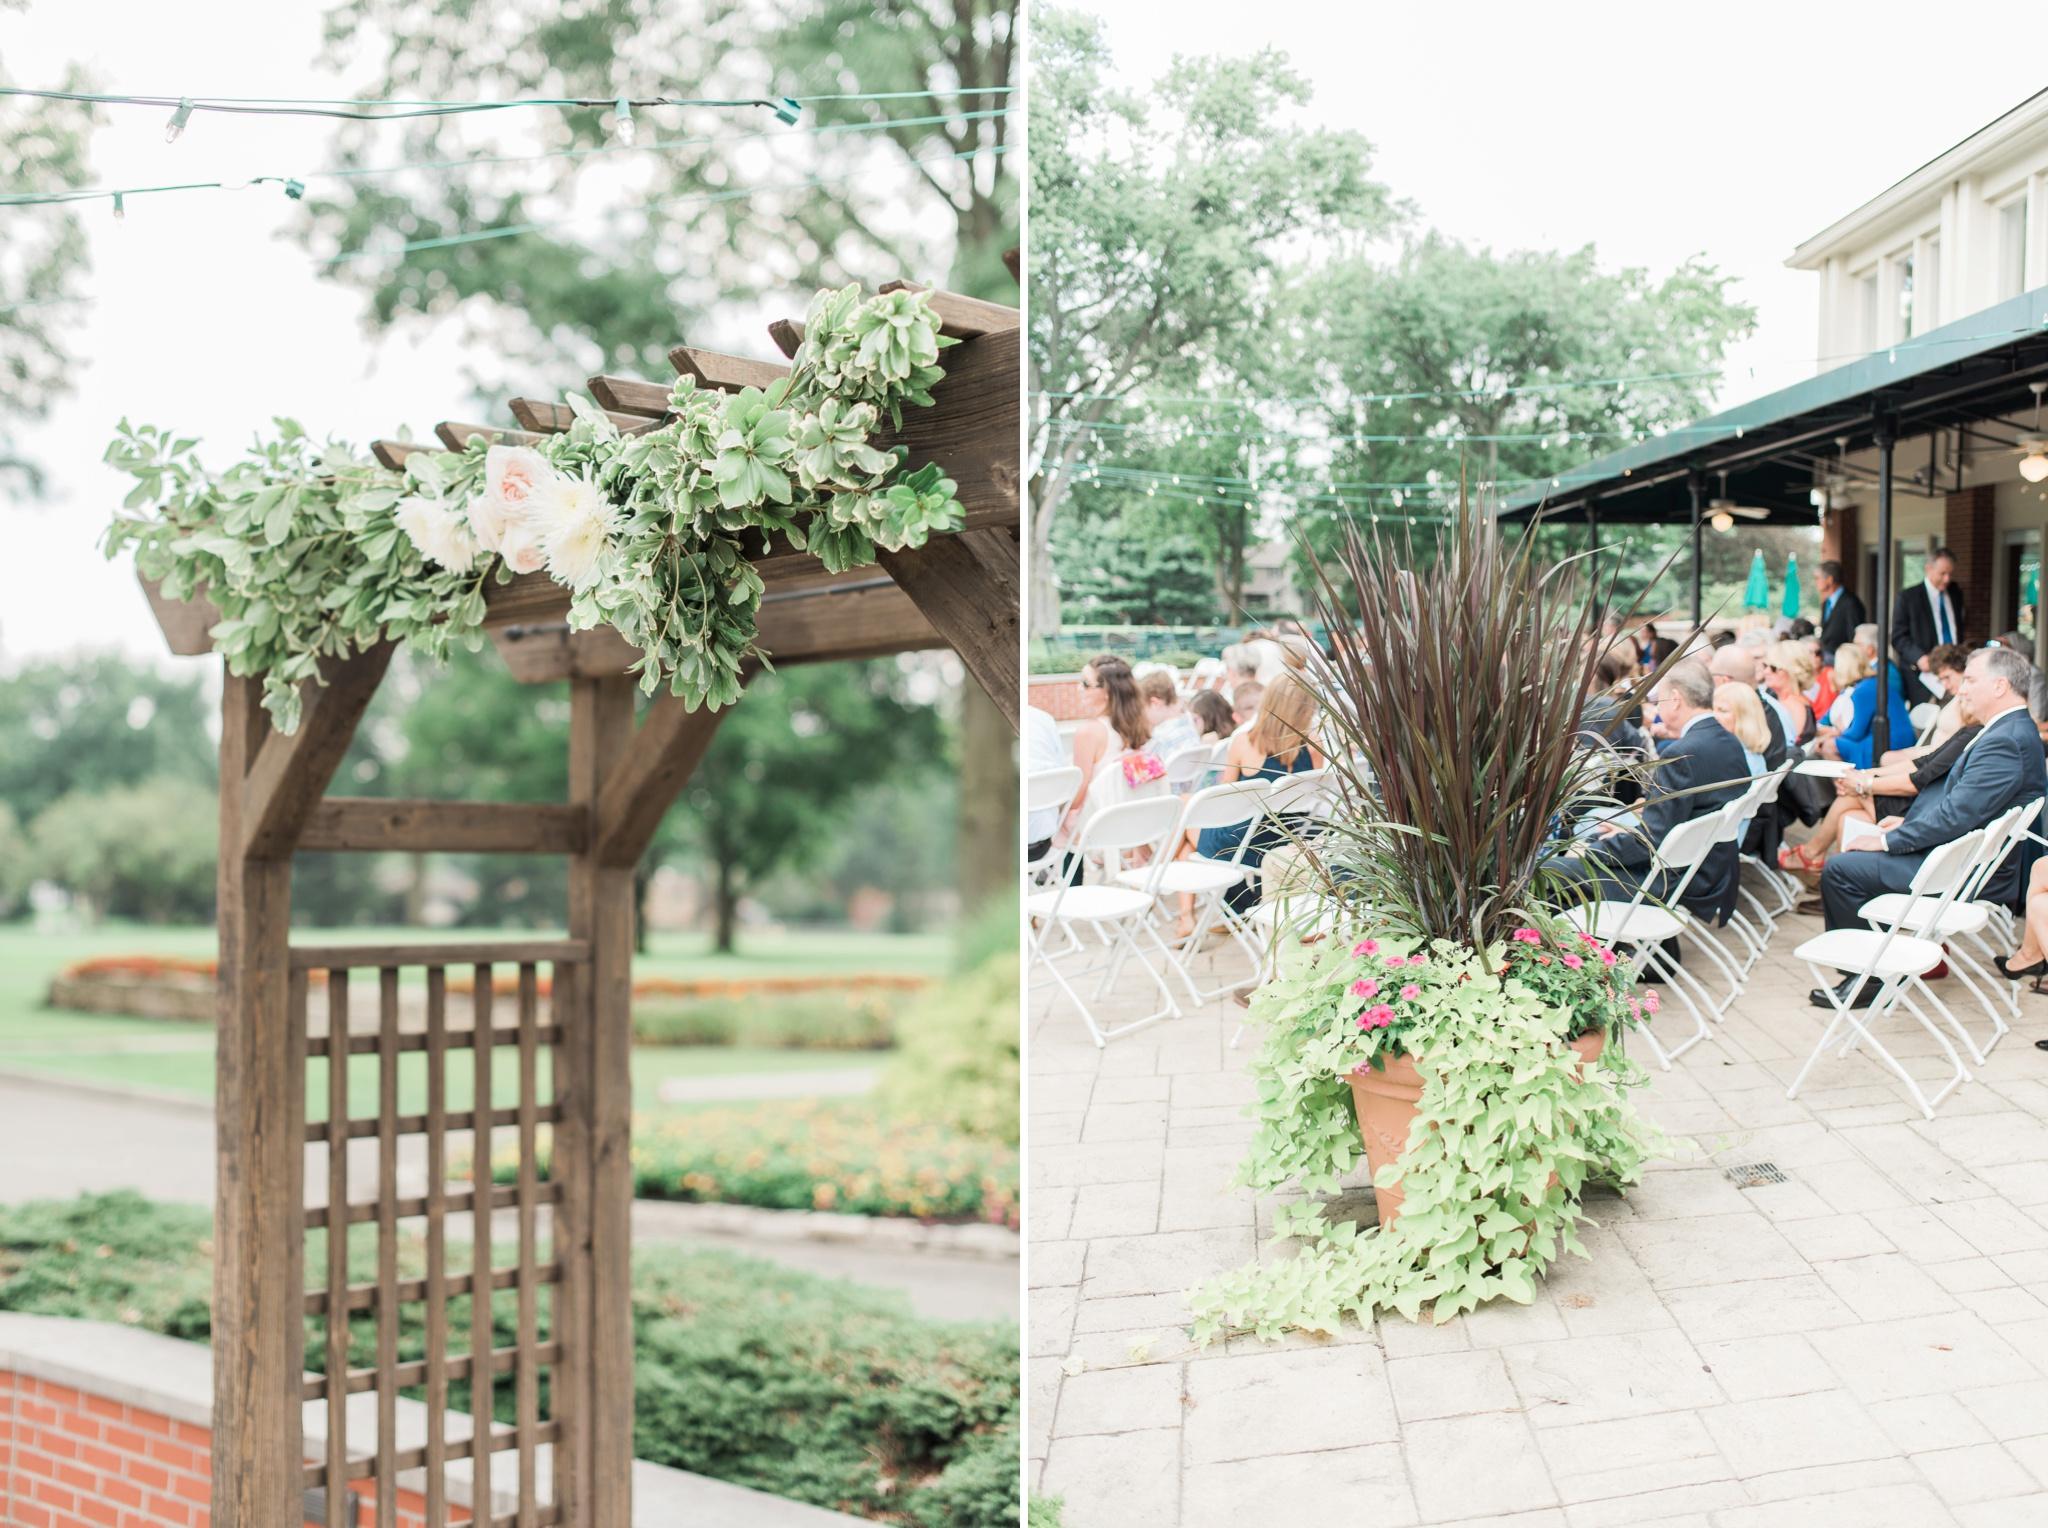 worthington-hills-country-club-wedding-columbus-ohio-meg-evan_0048.jpg